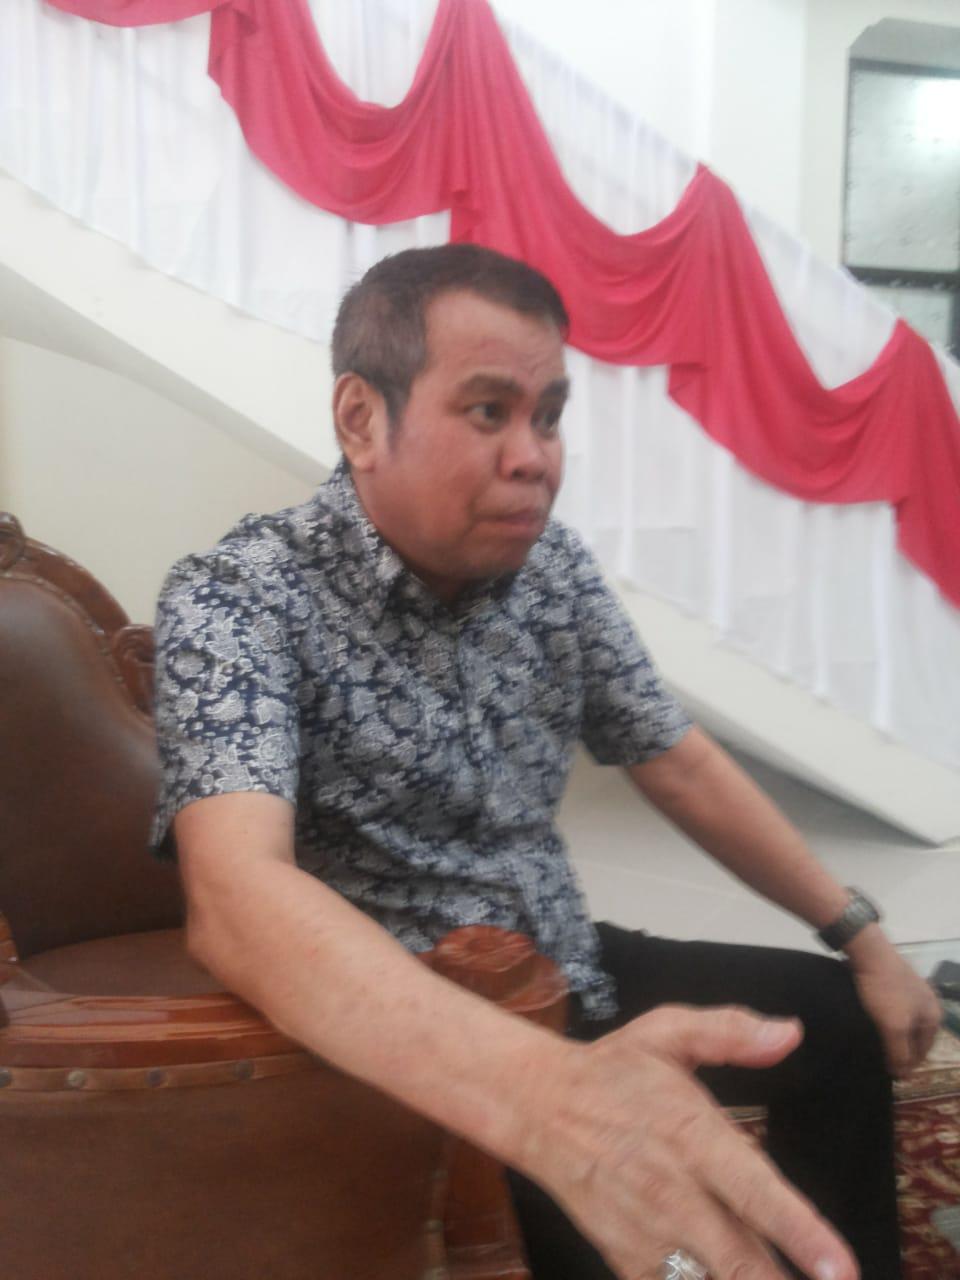 Wakil Bupati Bengkalis H. Muhammad ST,MP, Bakal Calon Bupati Bengkalis Riau Pada 2020